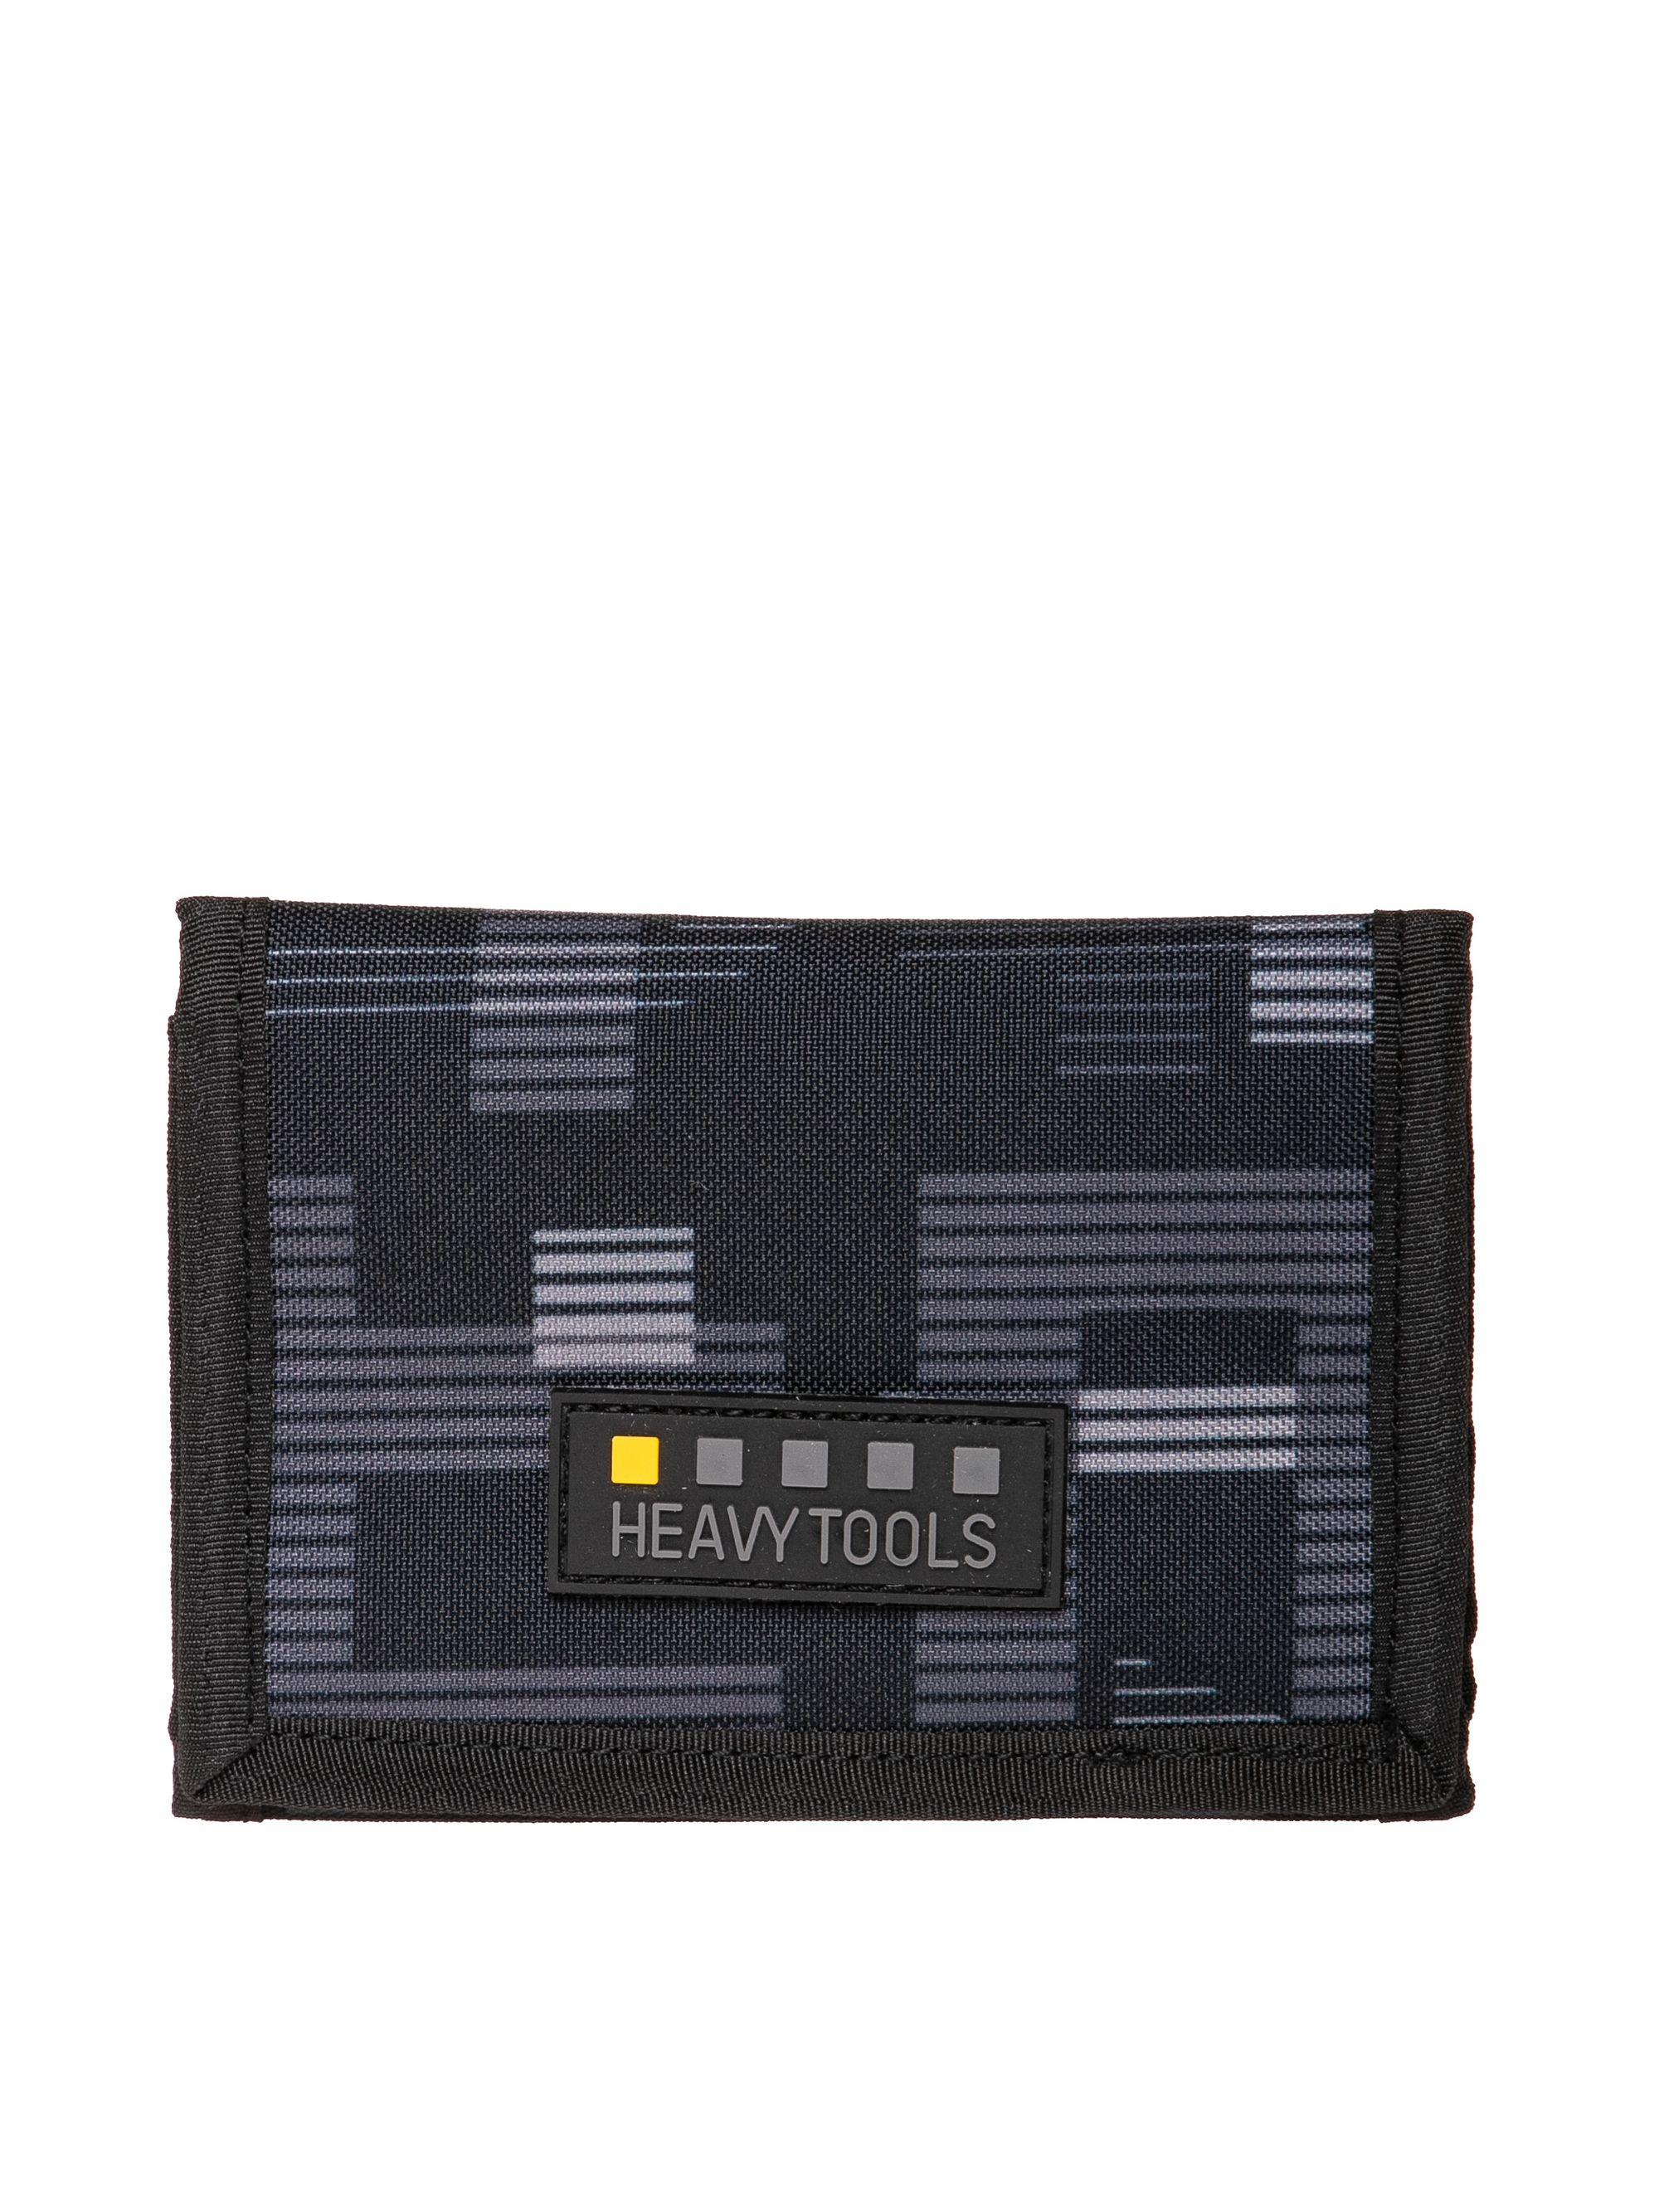 Heavy Tools pánská peněženka EDORKA20 šedá